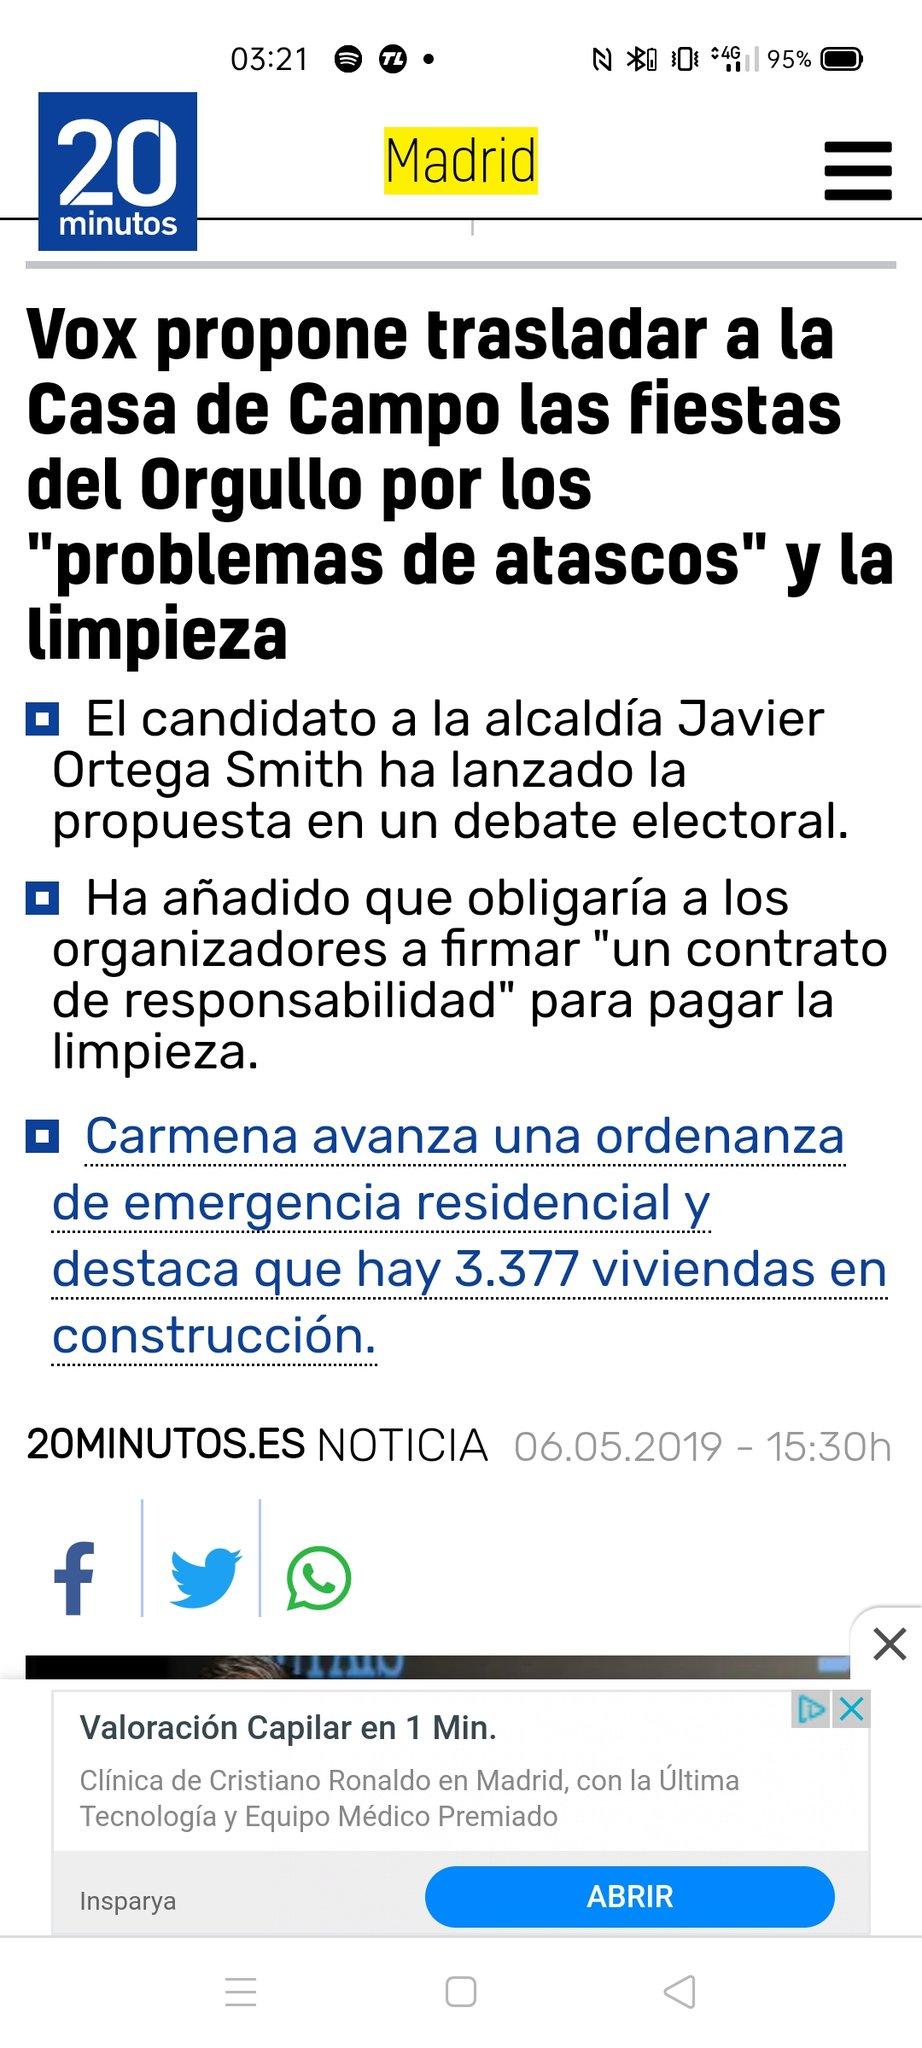 #Elecciones4M Photo,#Elecciones4M Twitter Trend : Most Popular Tweets